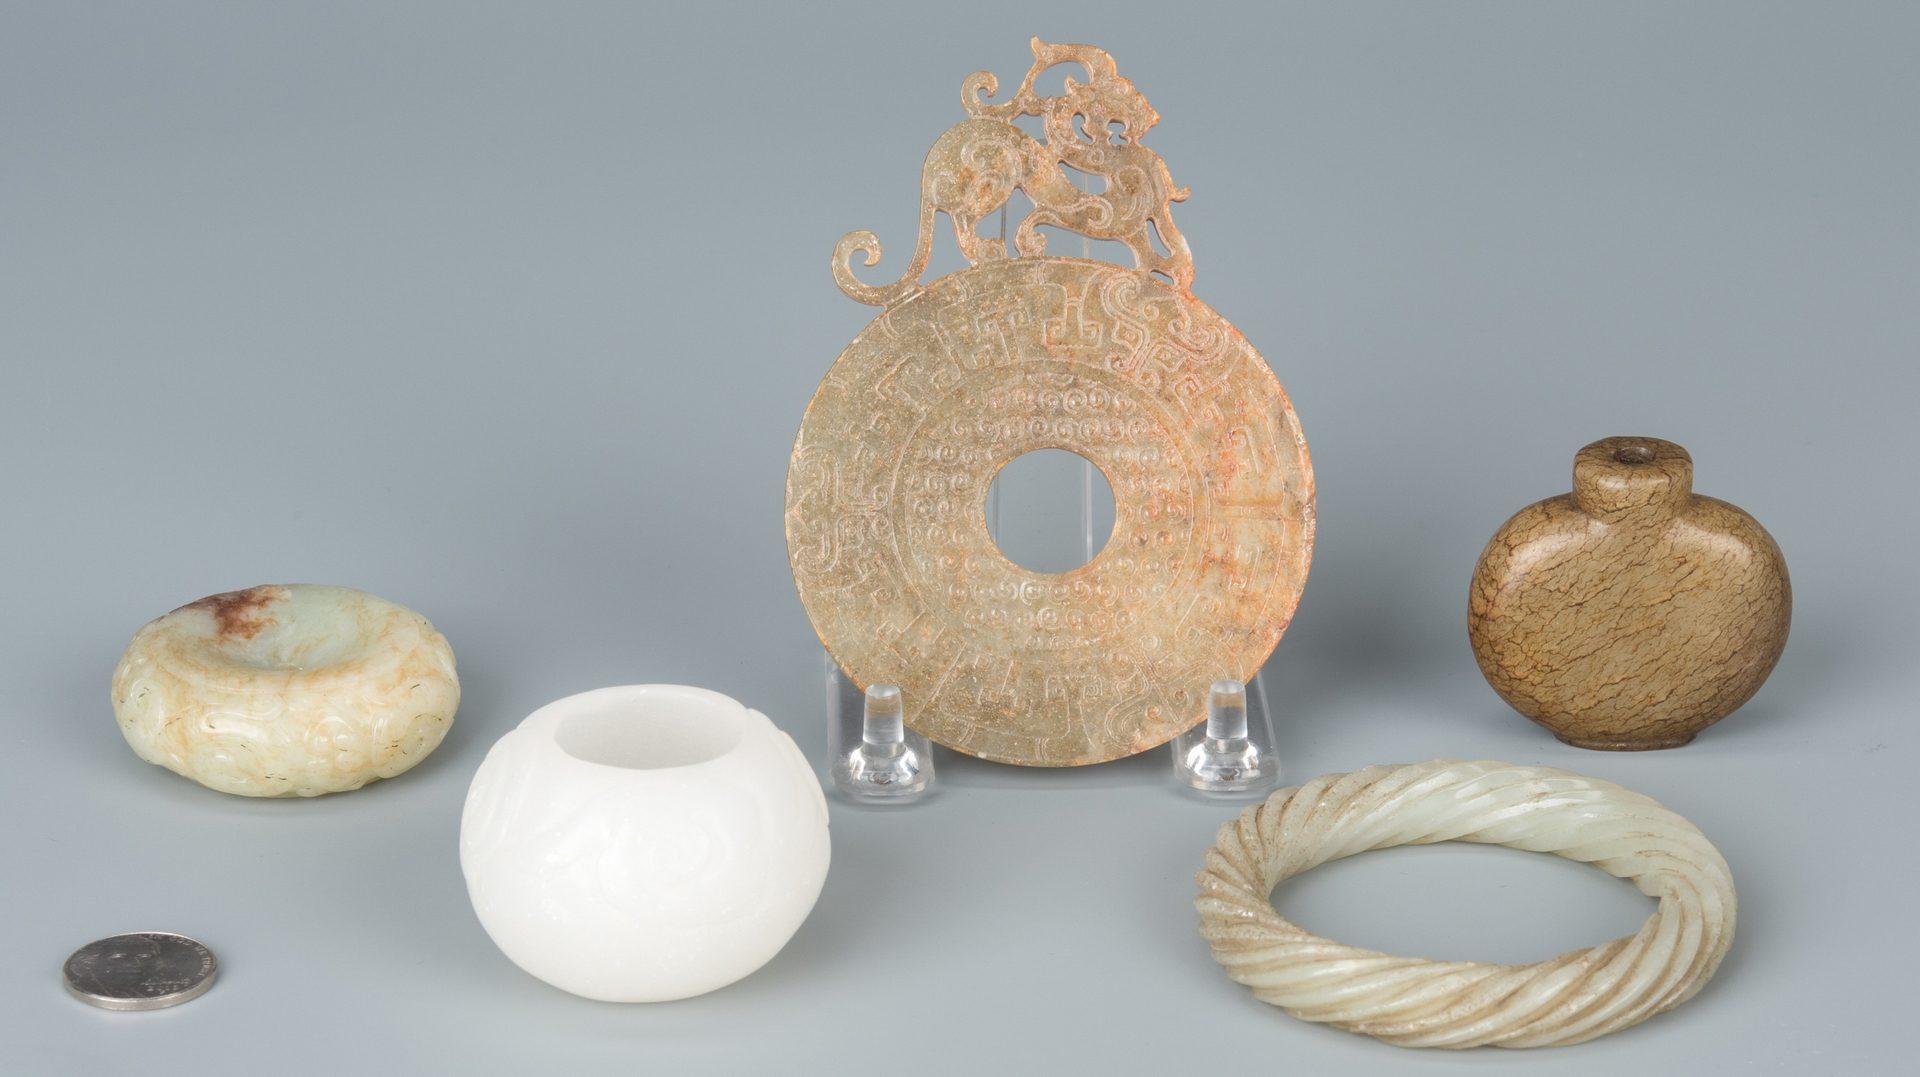 Lot 134: 5 Asst. Chinese Jade & Hardstone Items